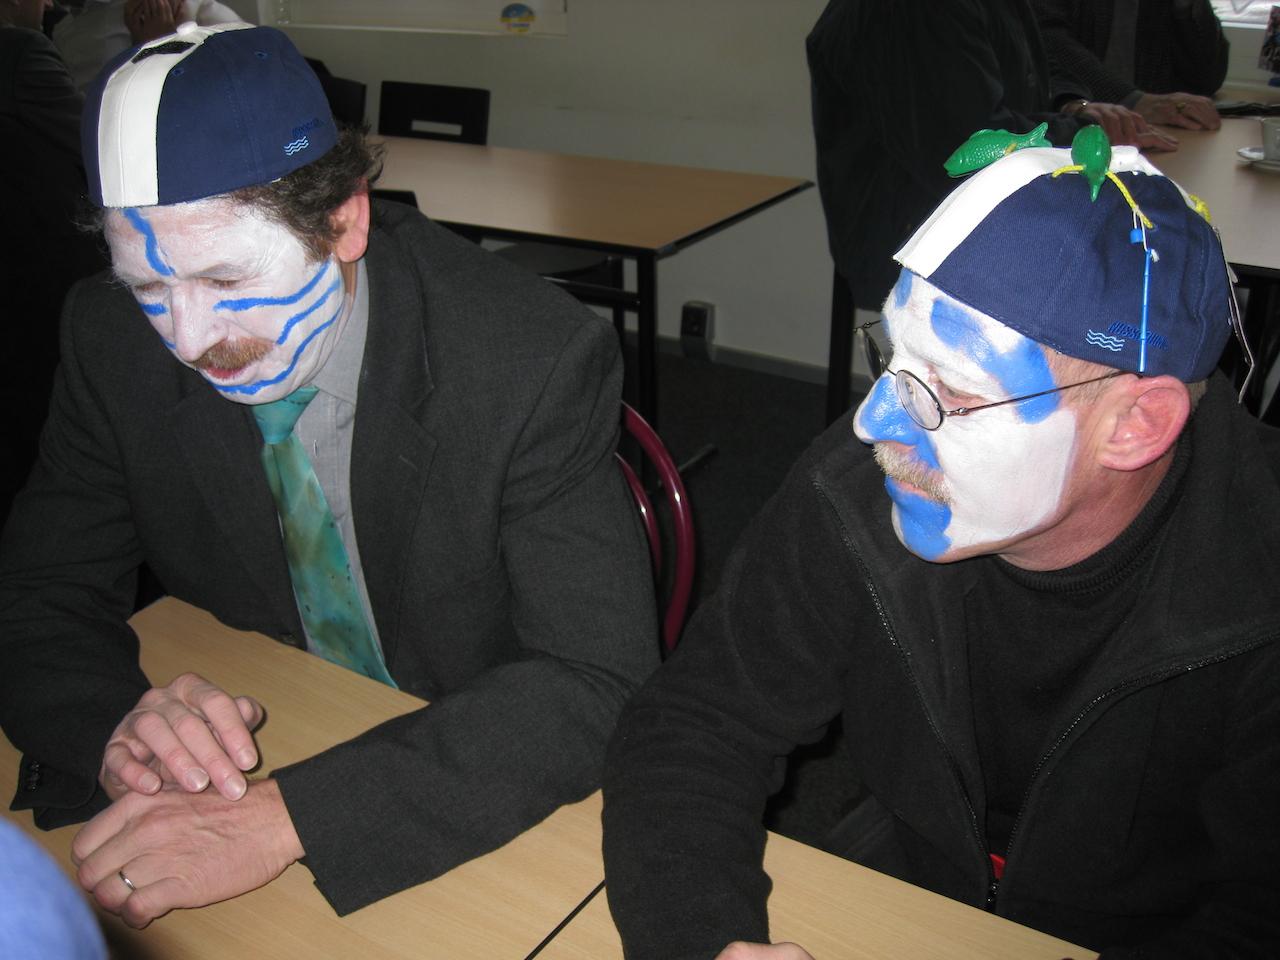 2010-02-11-sf-fasnacht-stampf-069